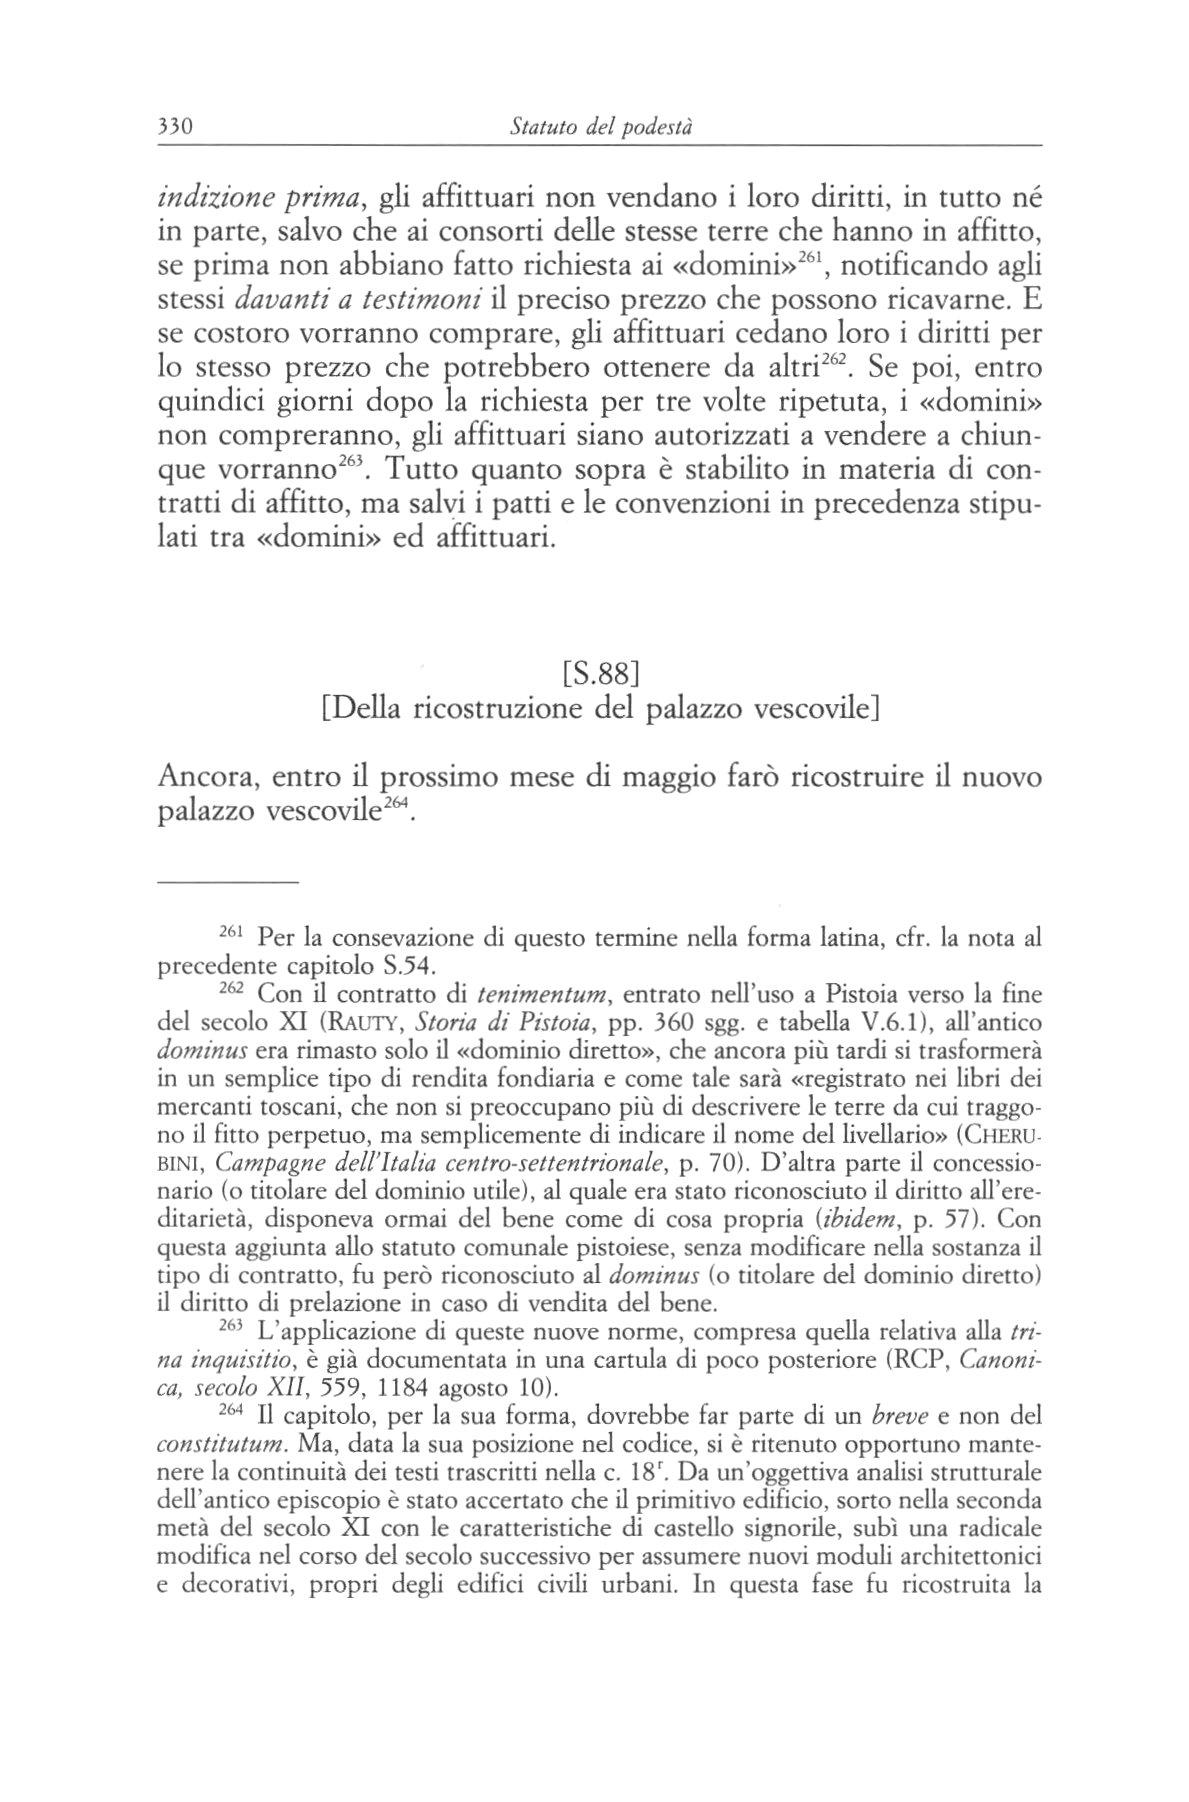 statuti pistoiesi del sec.XII 0330.jpg